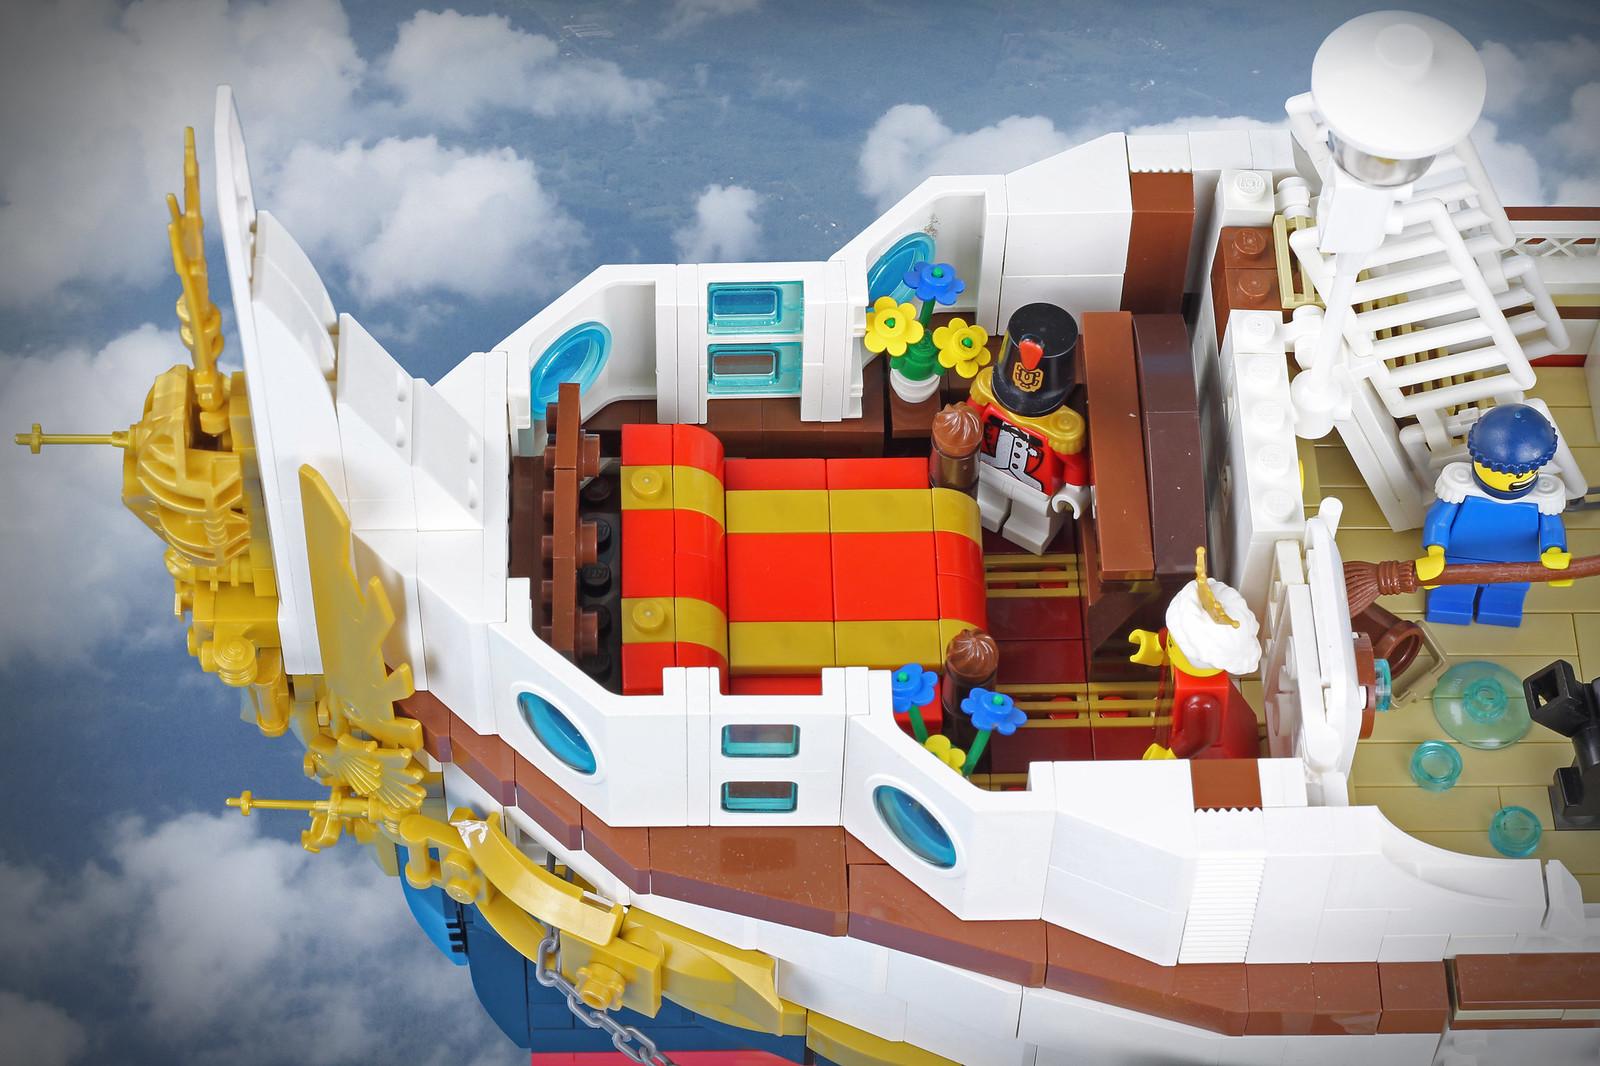 лего корабль облако